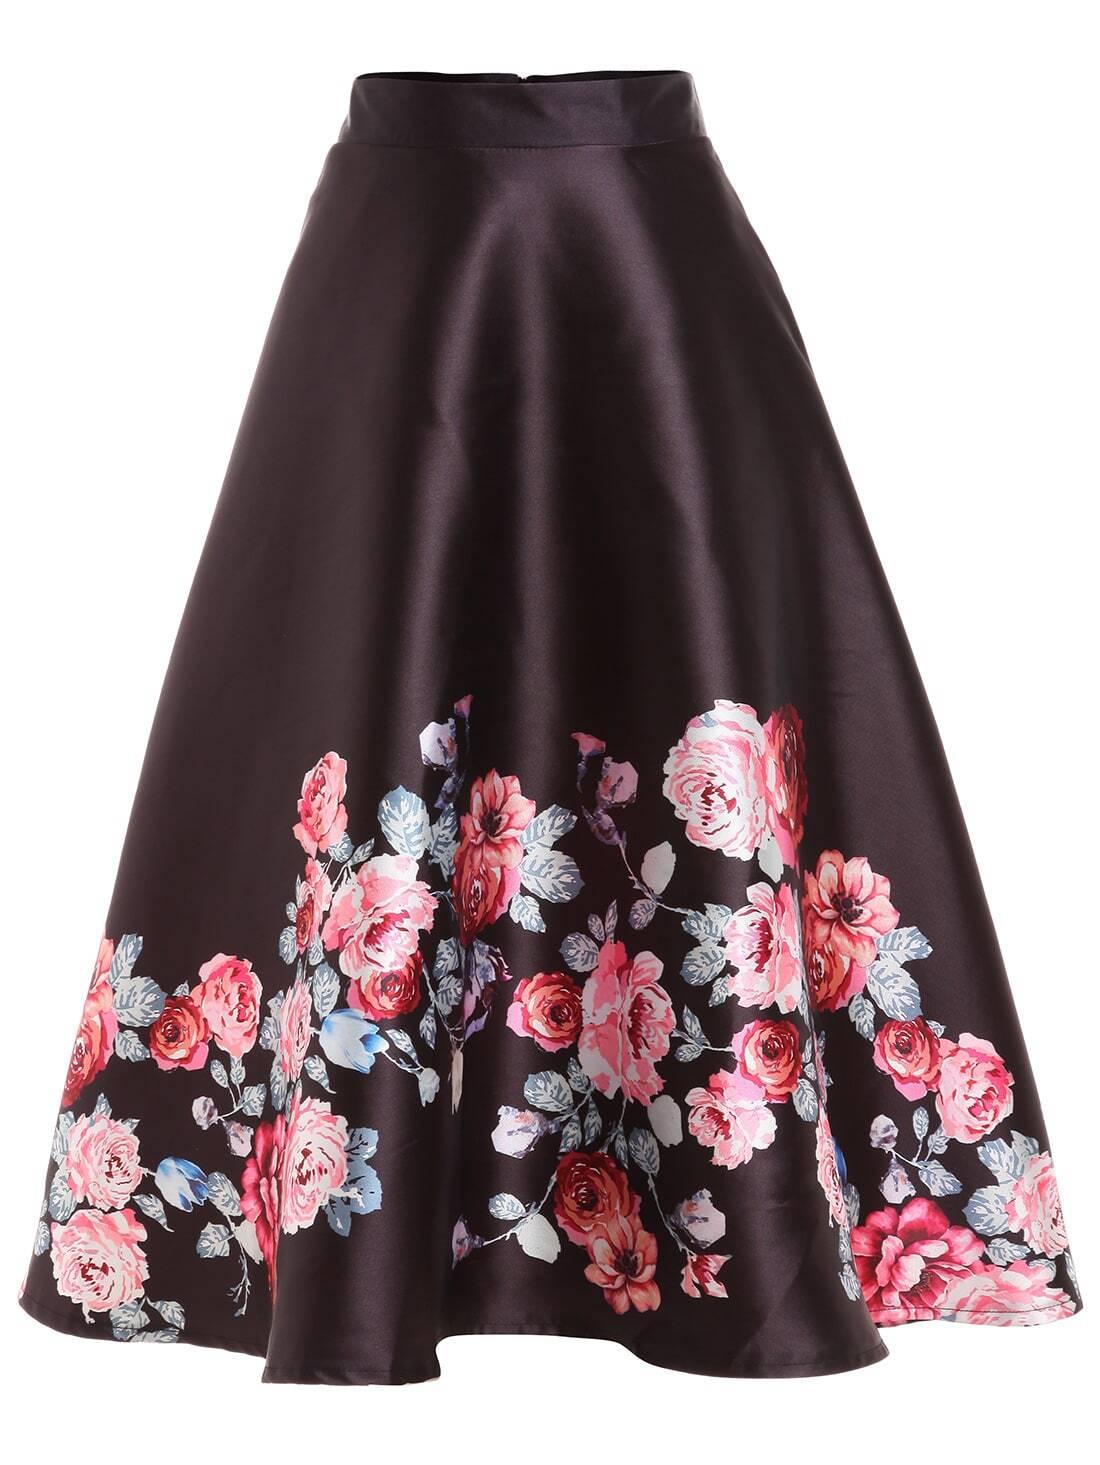 jupe mi longue motif fleuri noir french romwe. Black Bedroom Furniture Sets. Home Design Ideas